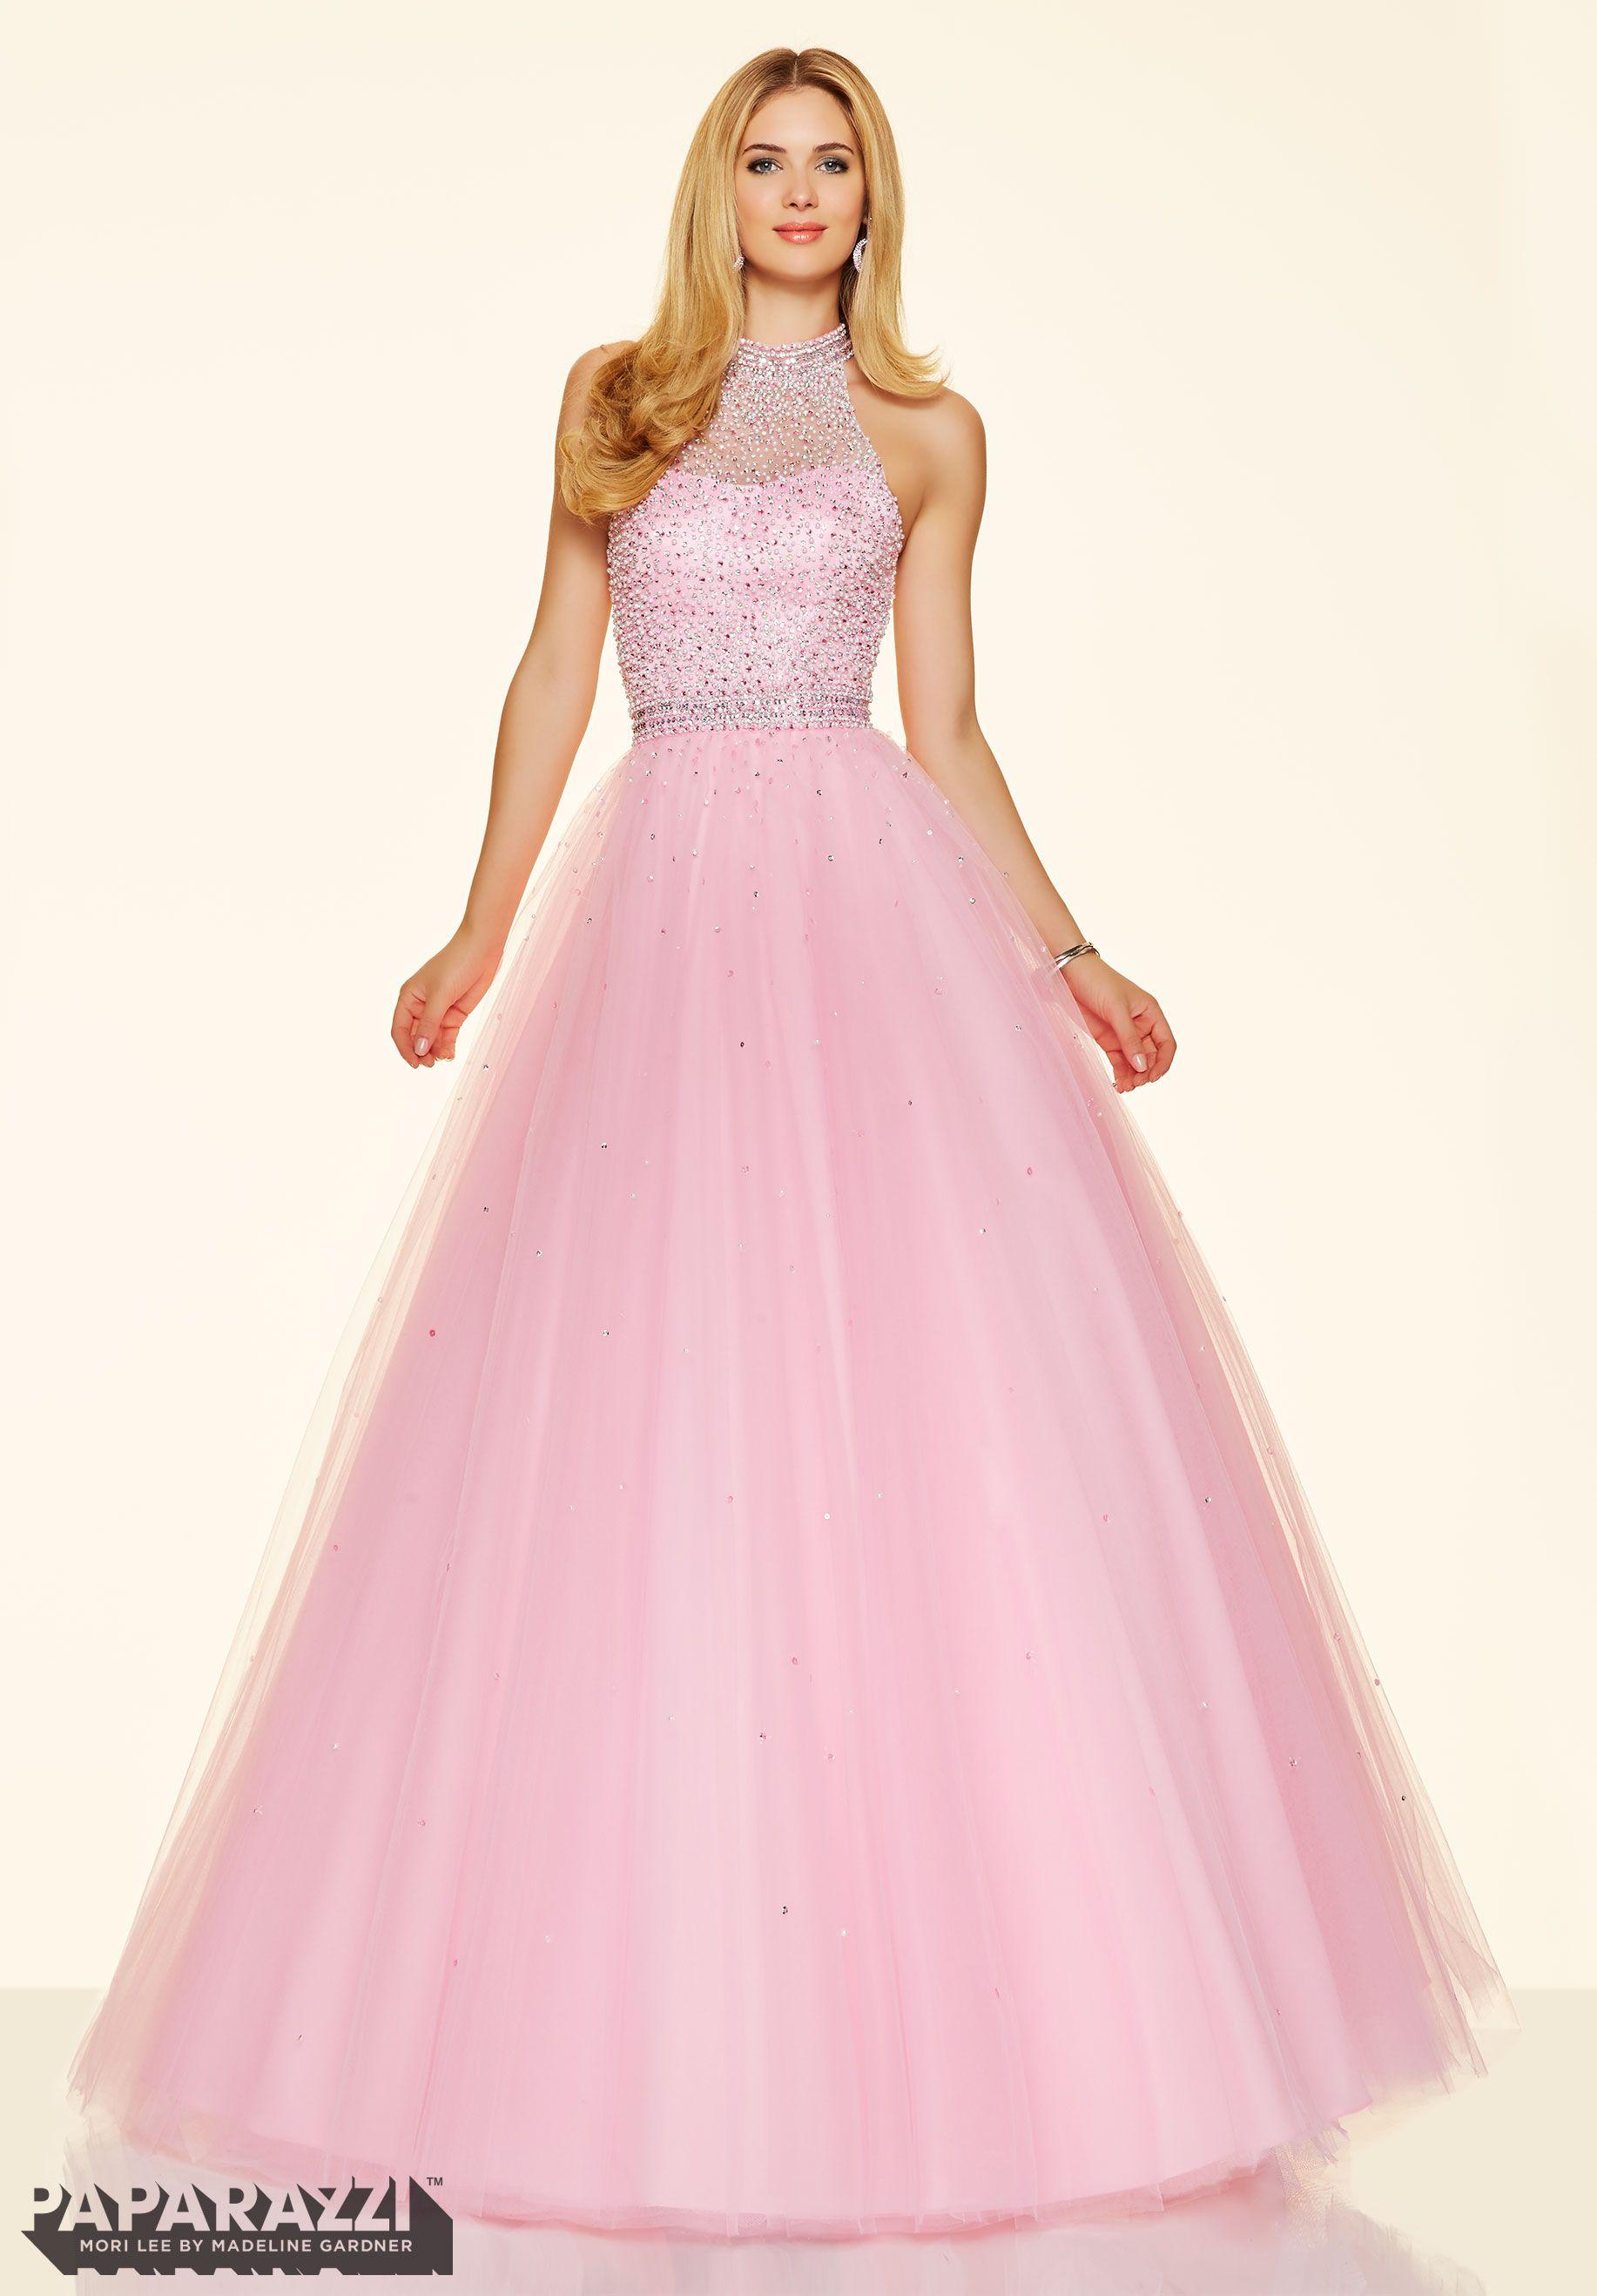 Prom Dress 98096 Beaded Tulle Ball Gown Light Pink | Prom | Pinterest